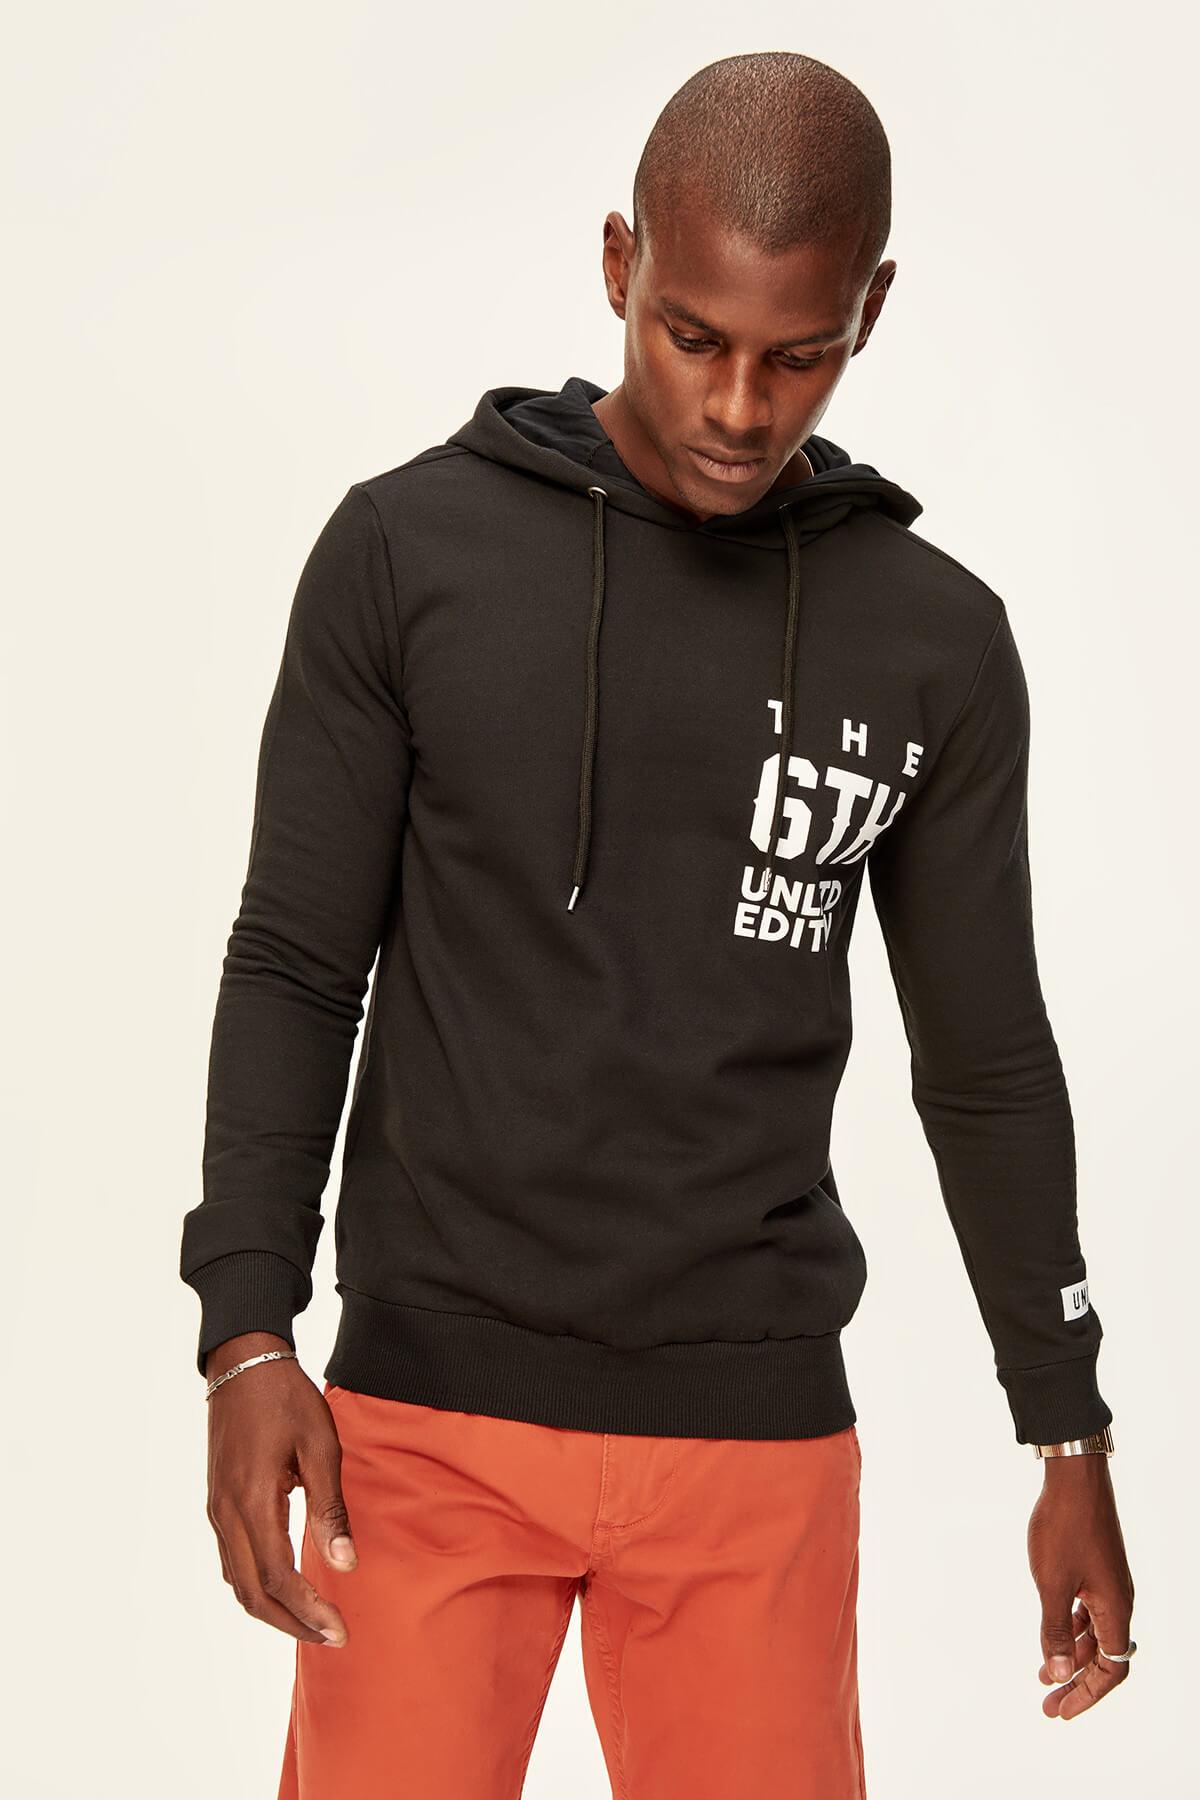 Trendyol Black Boys Cotton Sweatshirt-Hooded